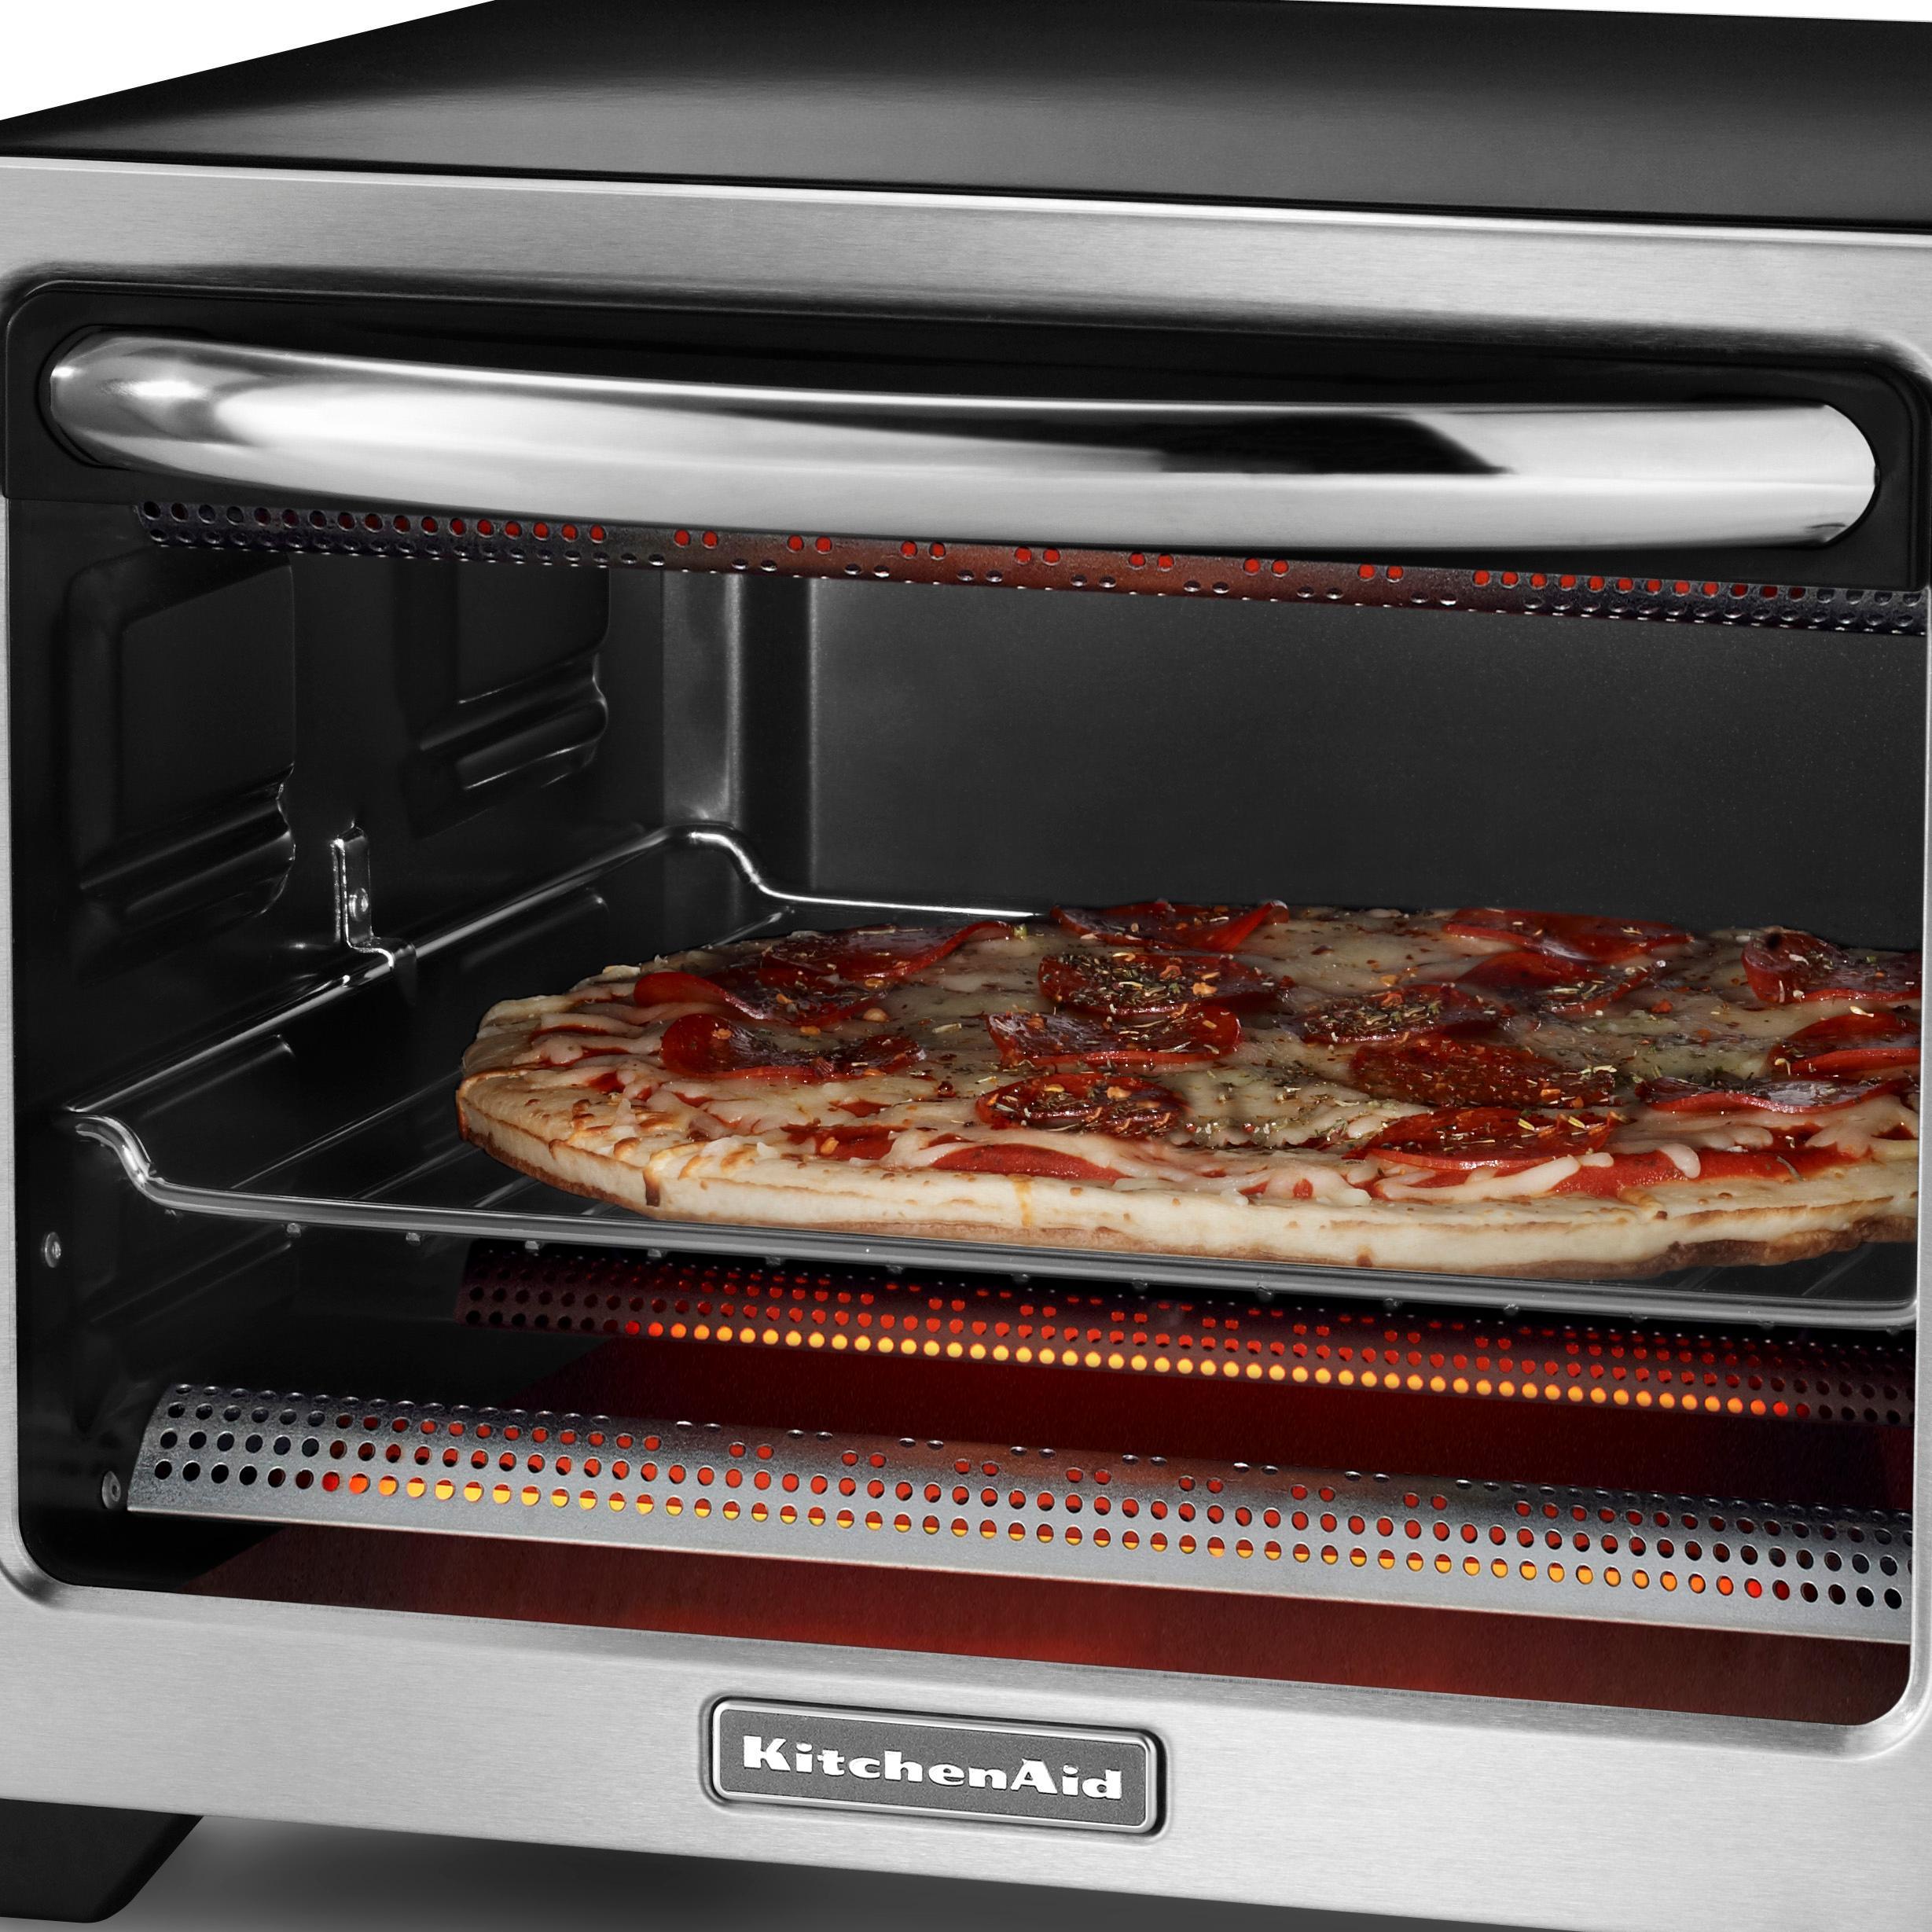 Amazon.com: KitchenAid KCO222OB Countertop Oven, Onyx Black ...